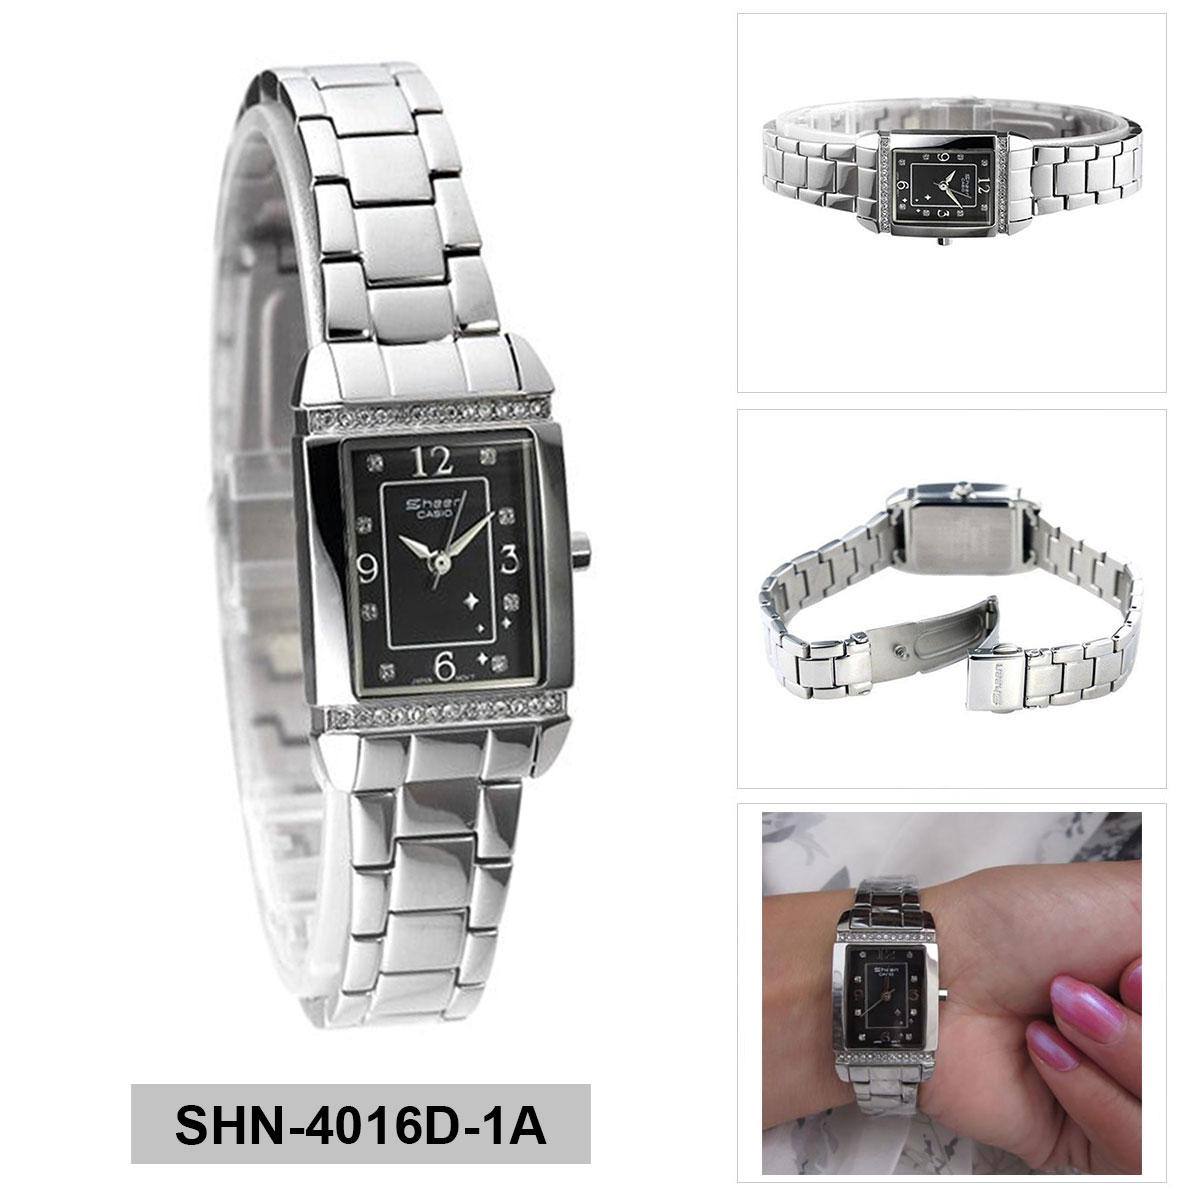 Jual Jam Tangan Casio Original G Shock Dobel Time Tahan Air Black Sheen Silver Stainless Steel Case Bracelet Ladies Shn 4016d